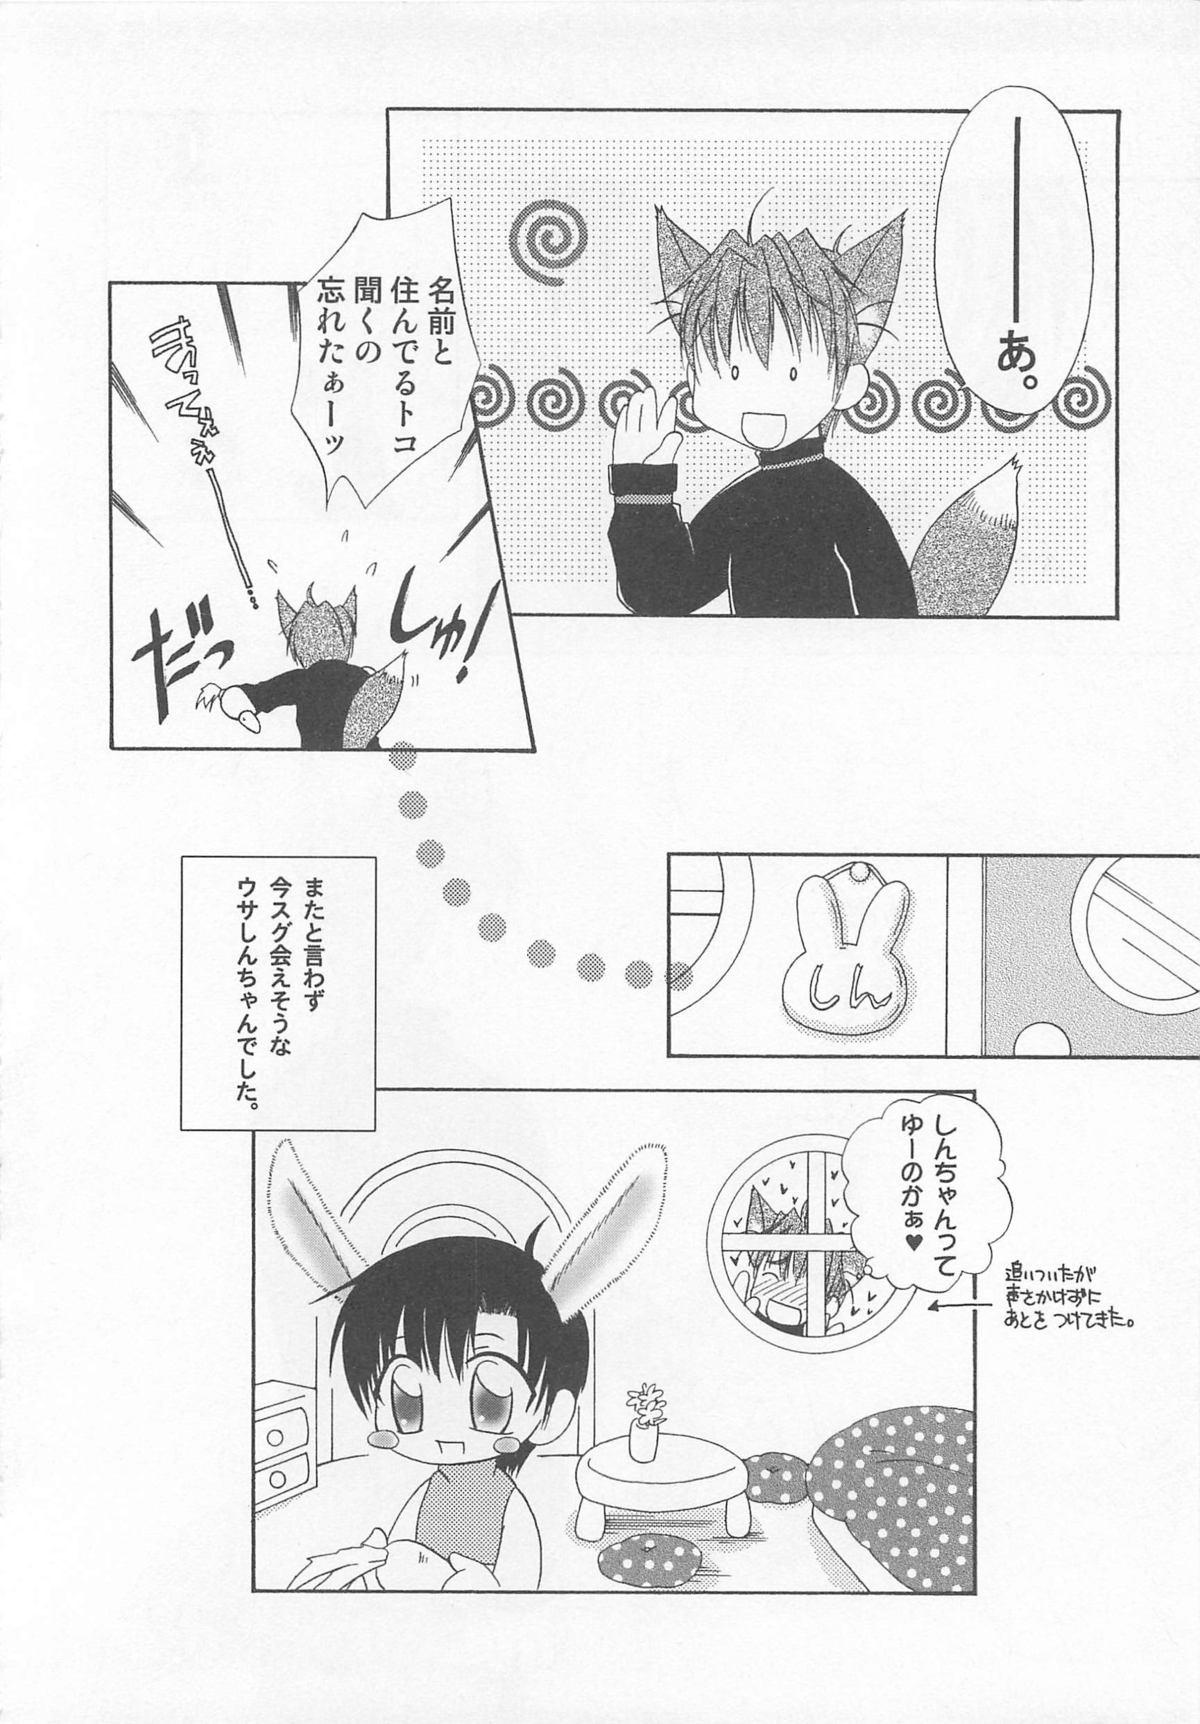 Otokonoko HEAVEN Vol. 02 Dokidoki Chikan Taiken 164